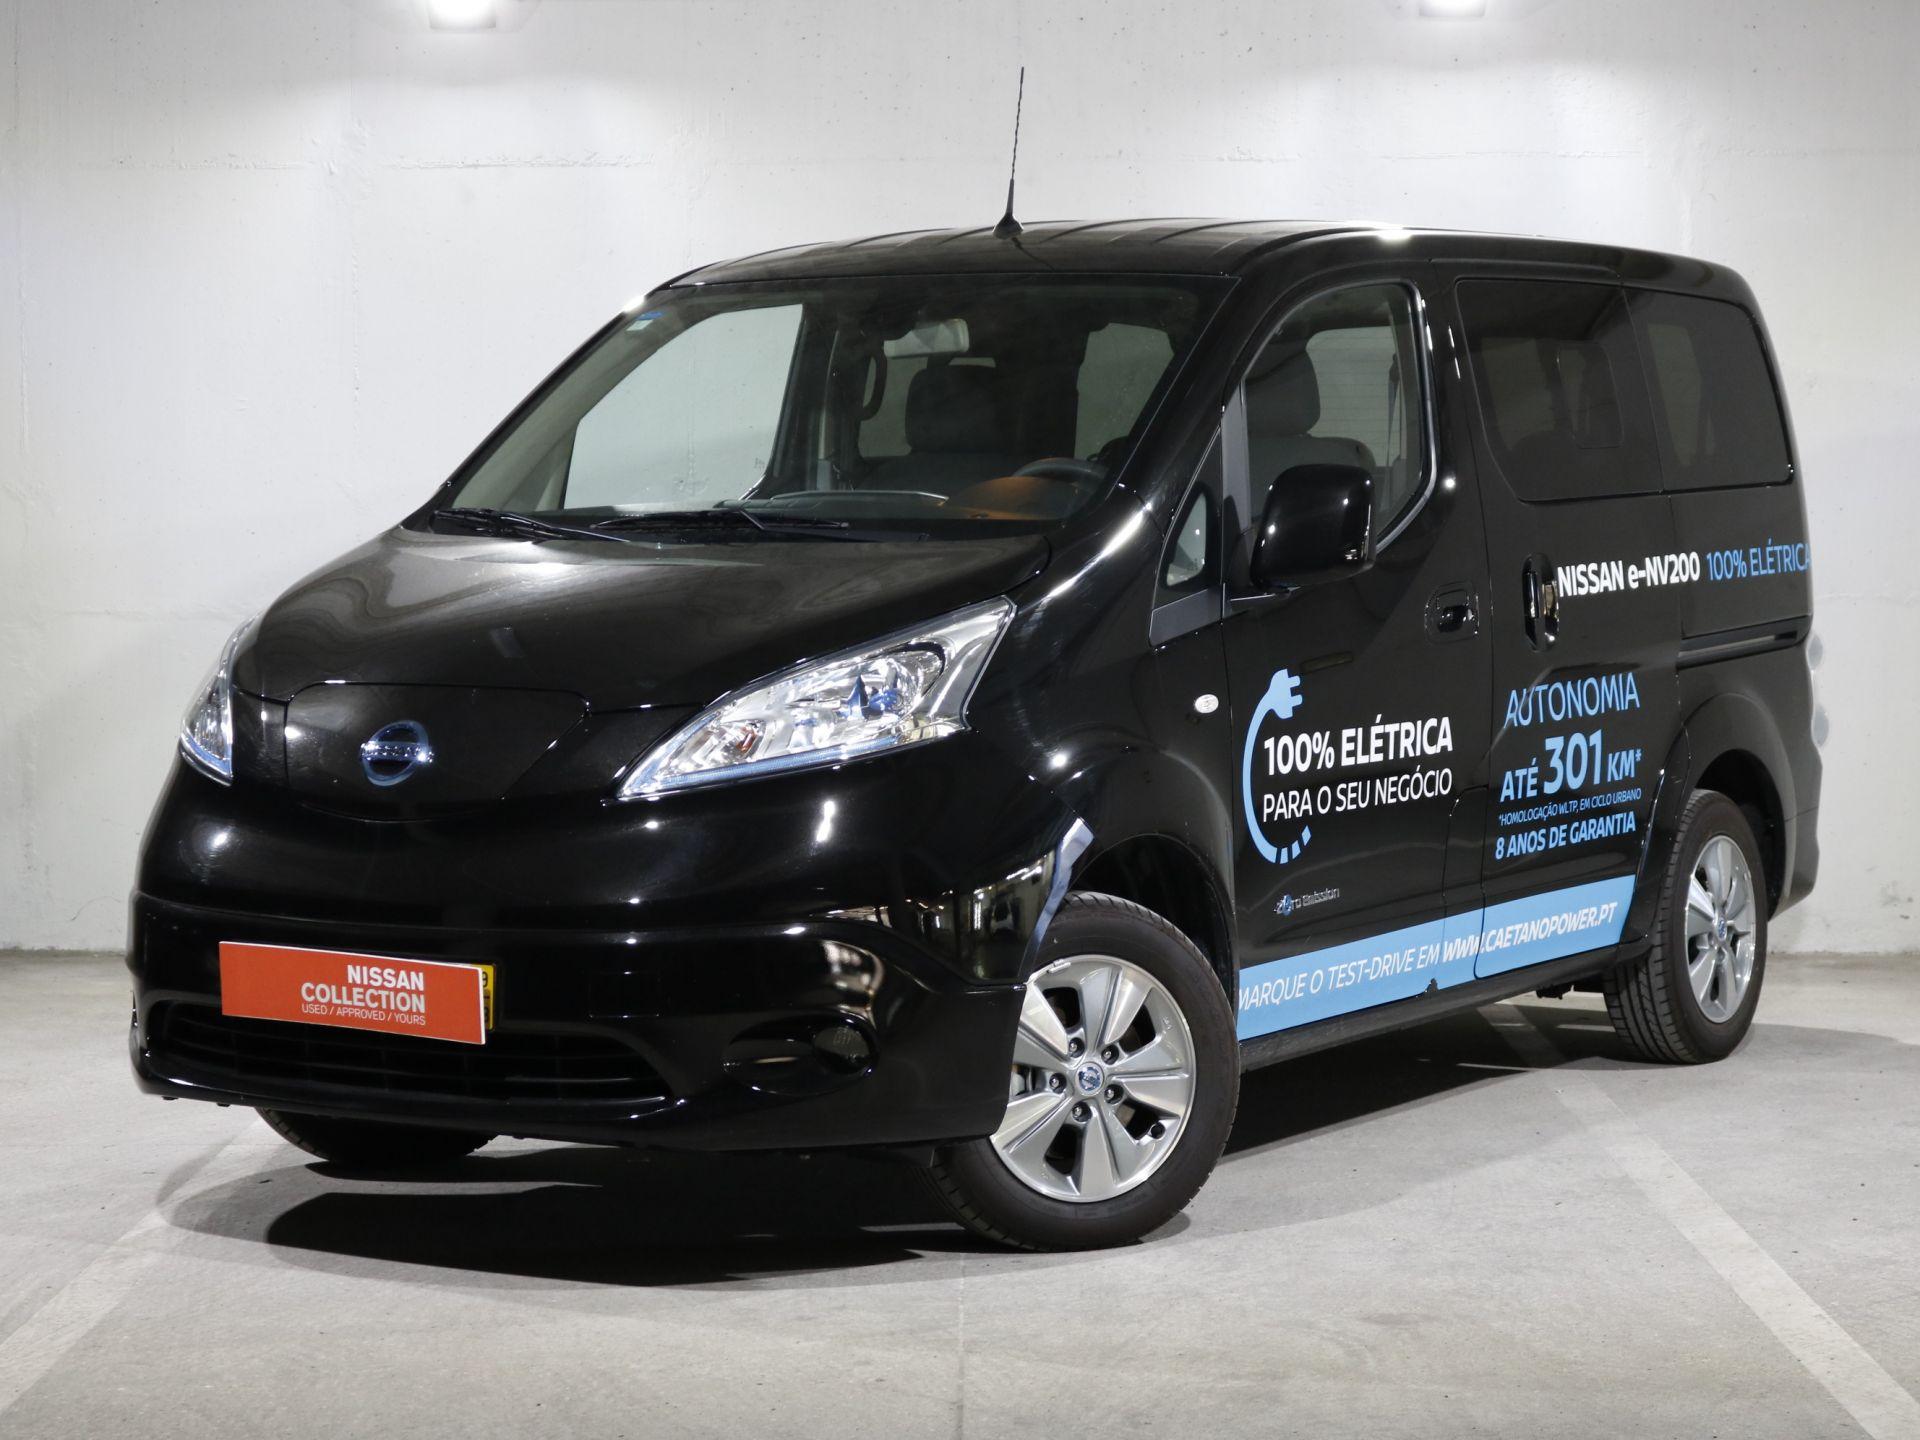 Nissan EVALIA Evalia 7 40 kWh Navegador usada Lisboa